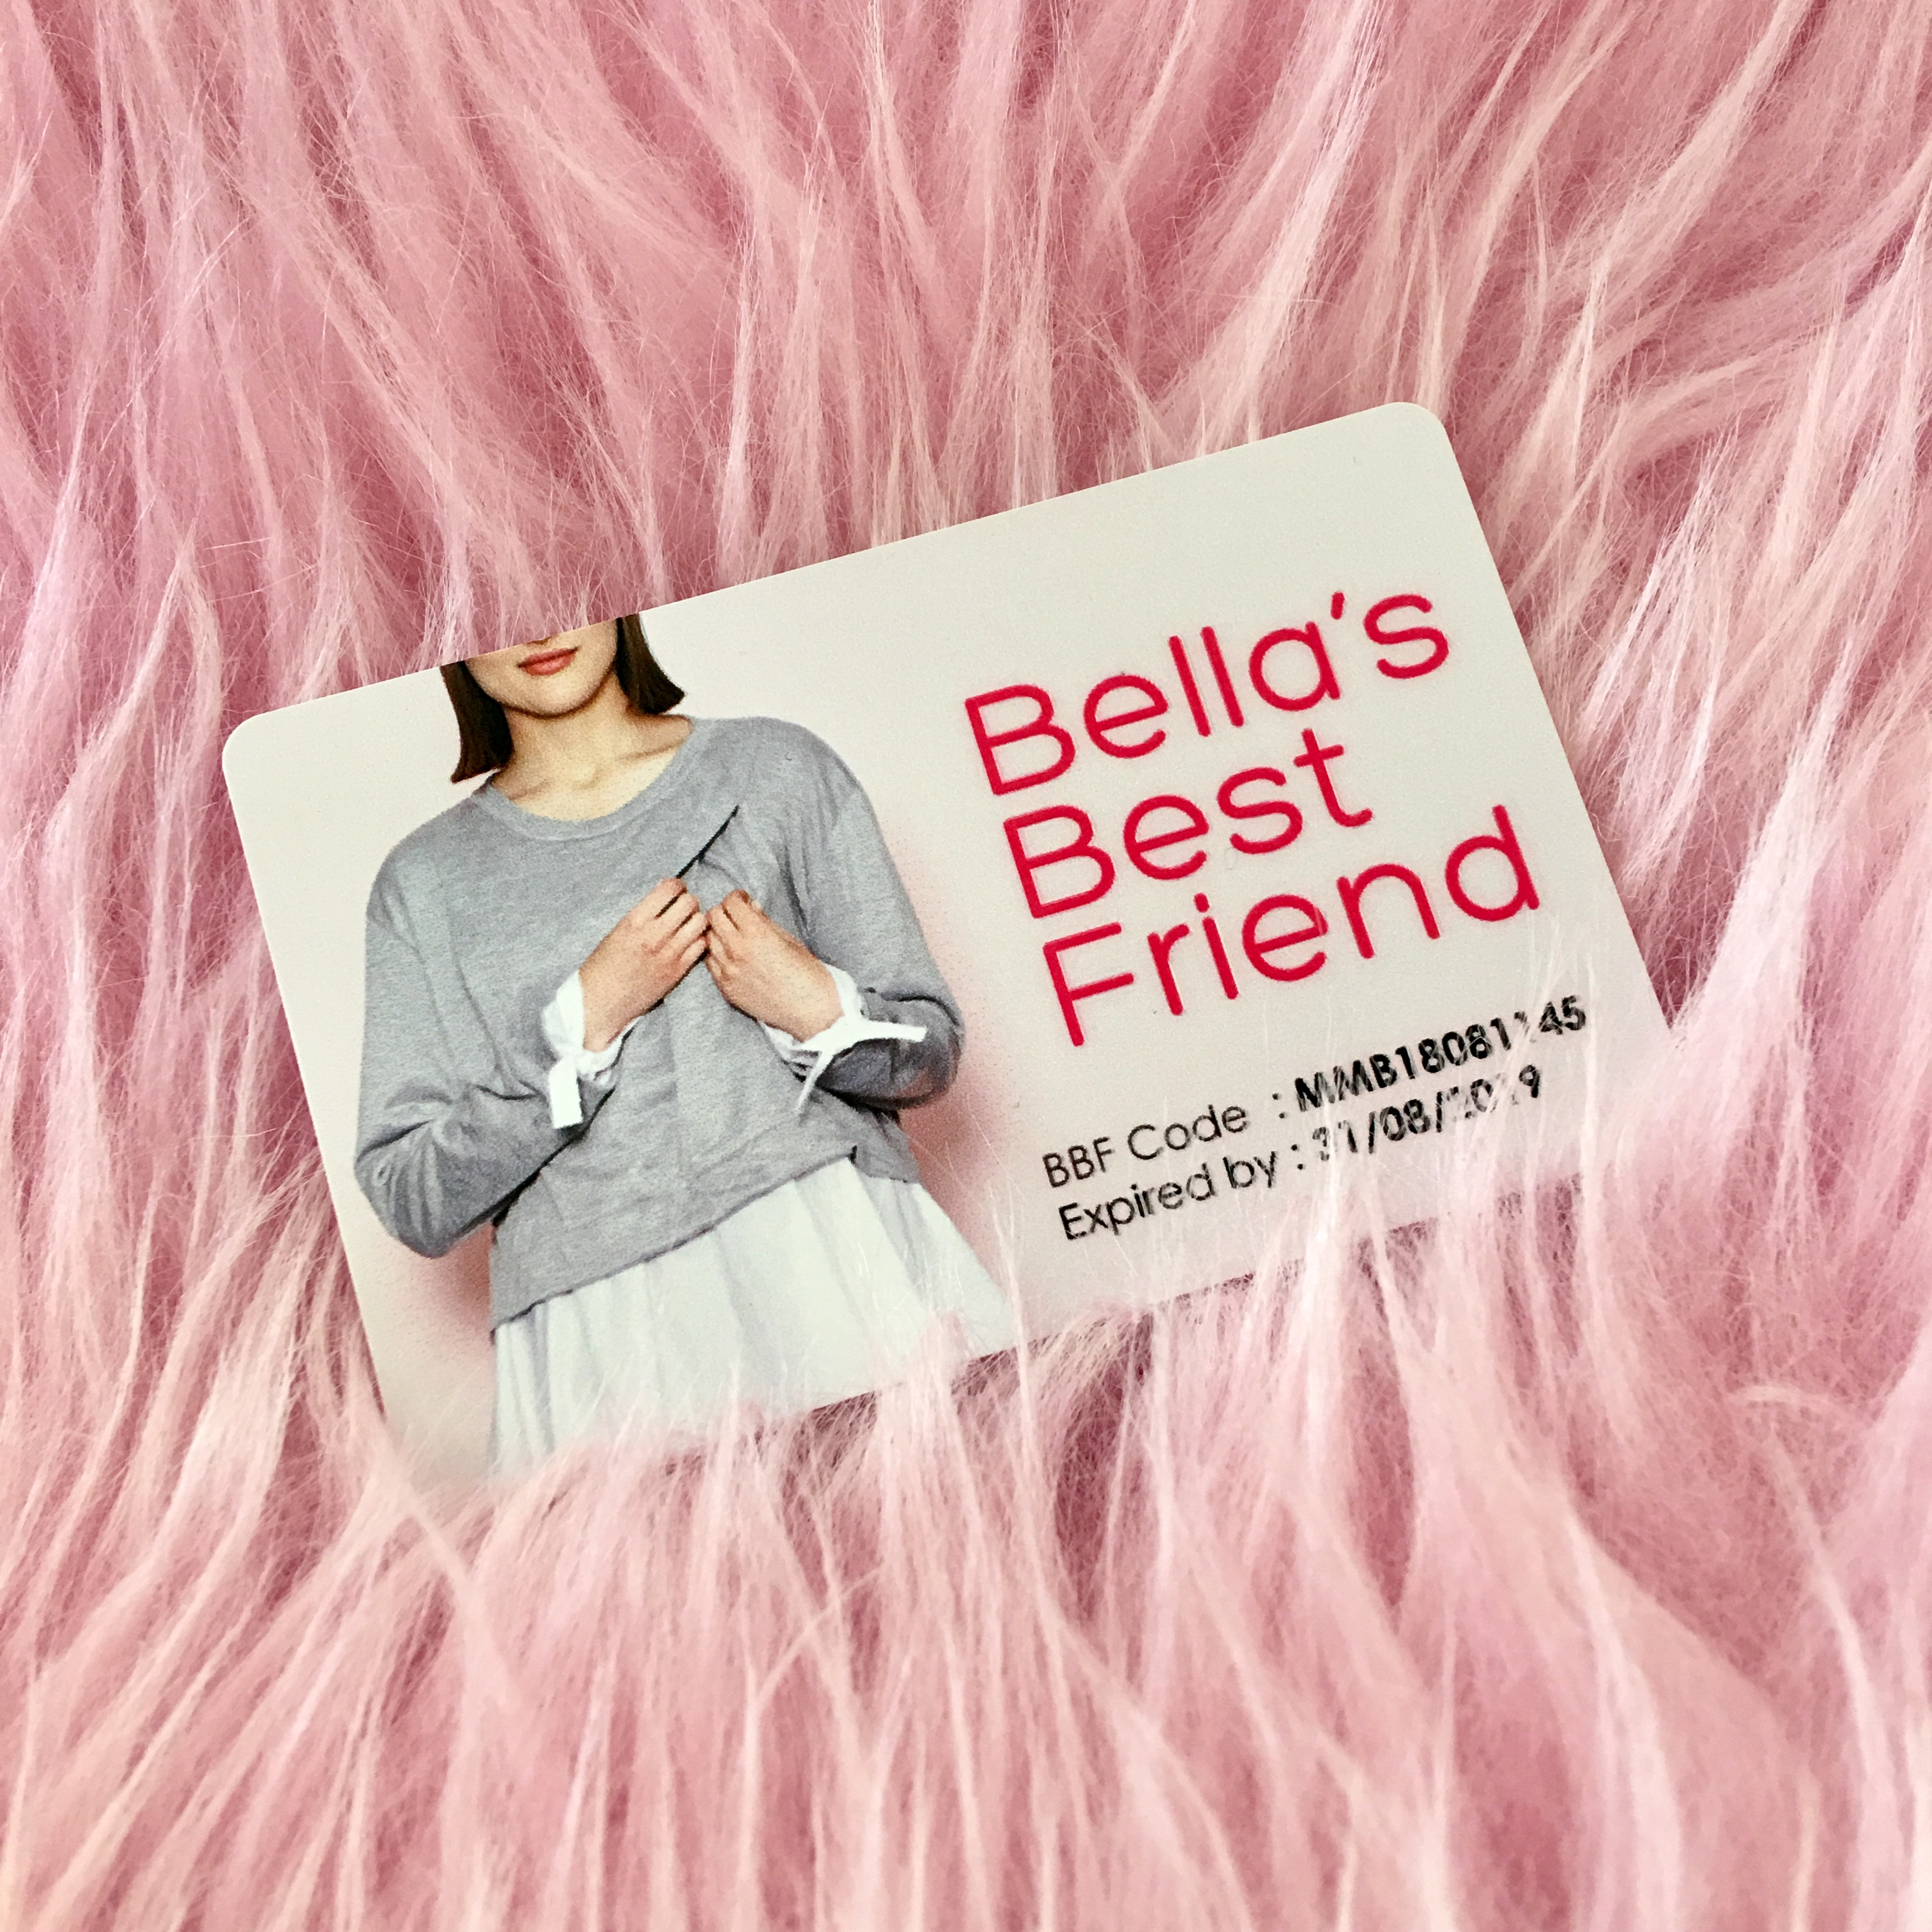 Bella's Best Friend Club! image